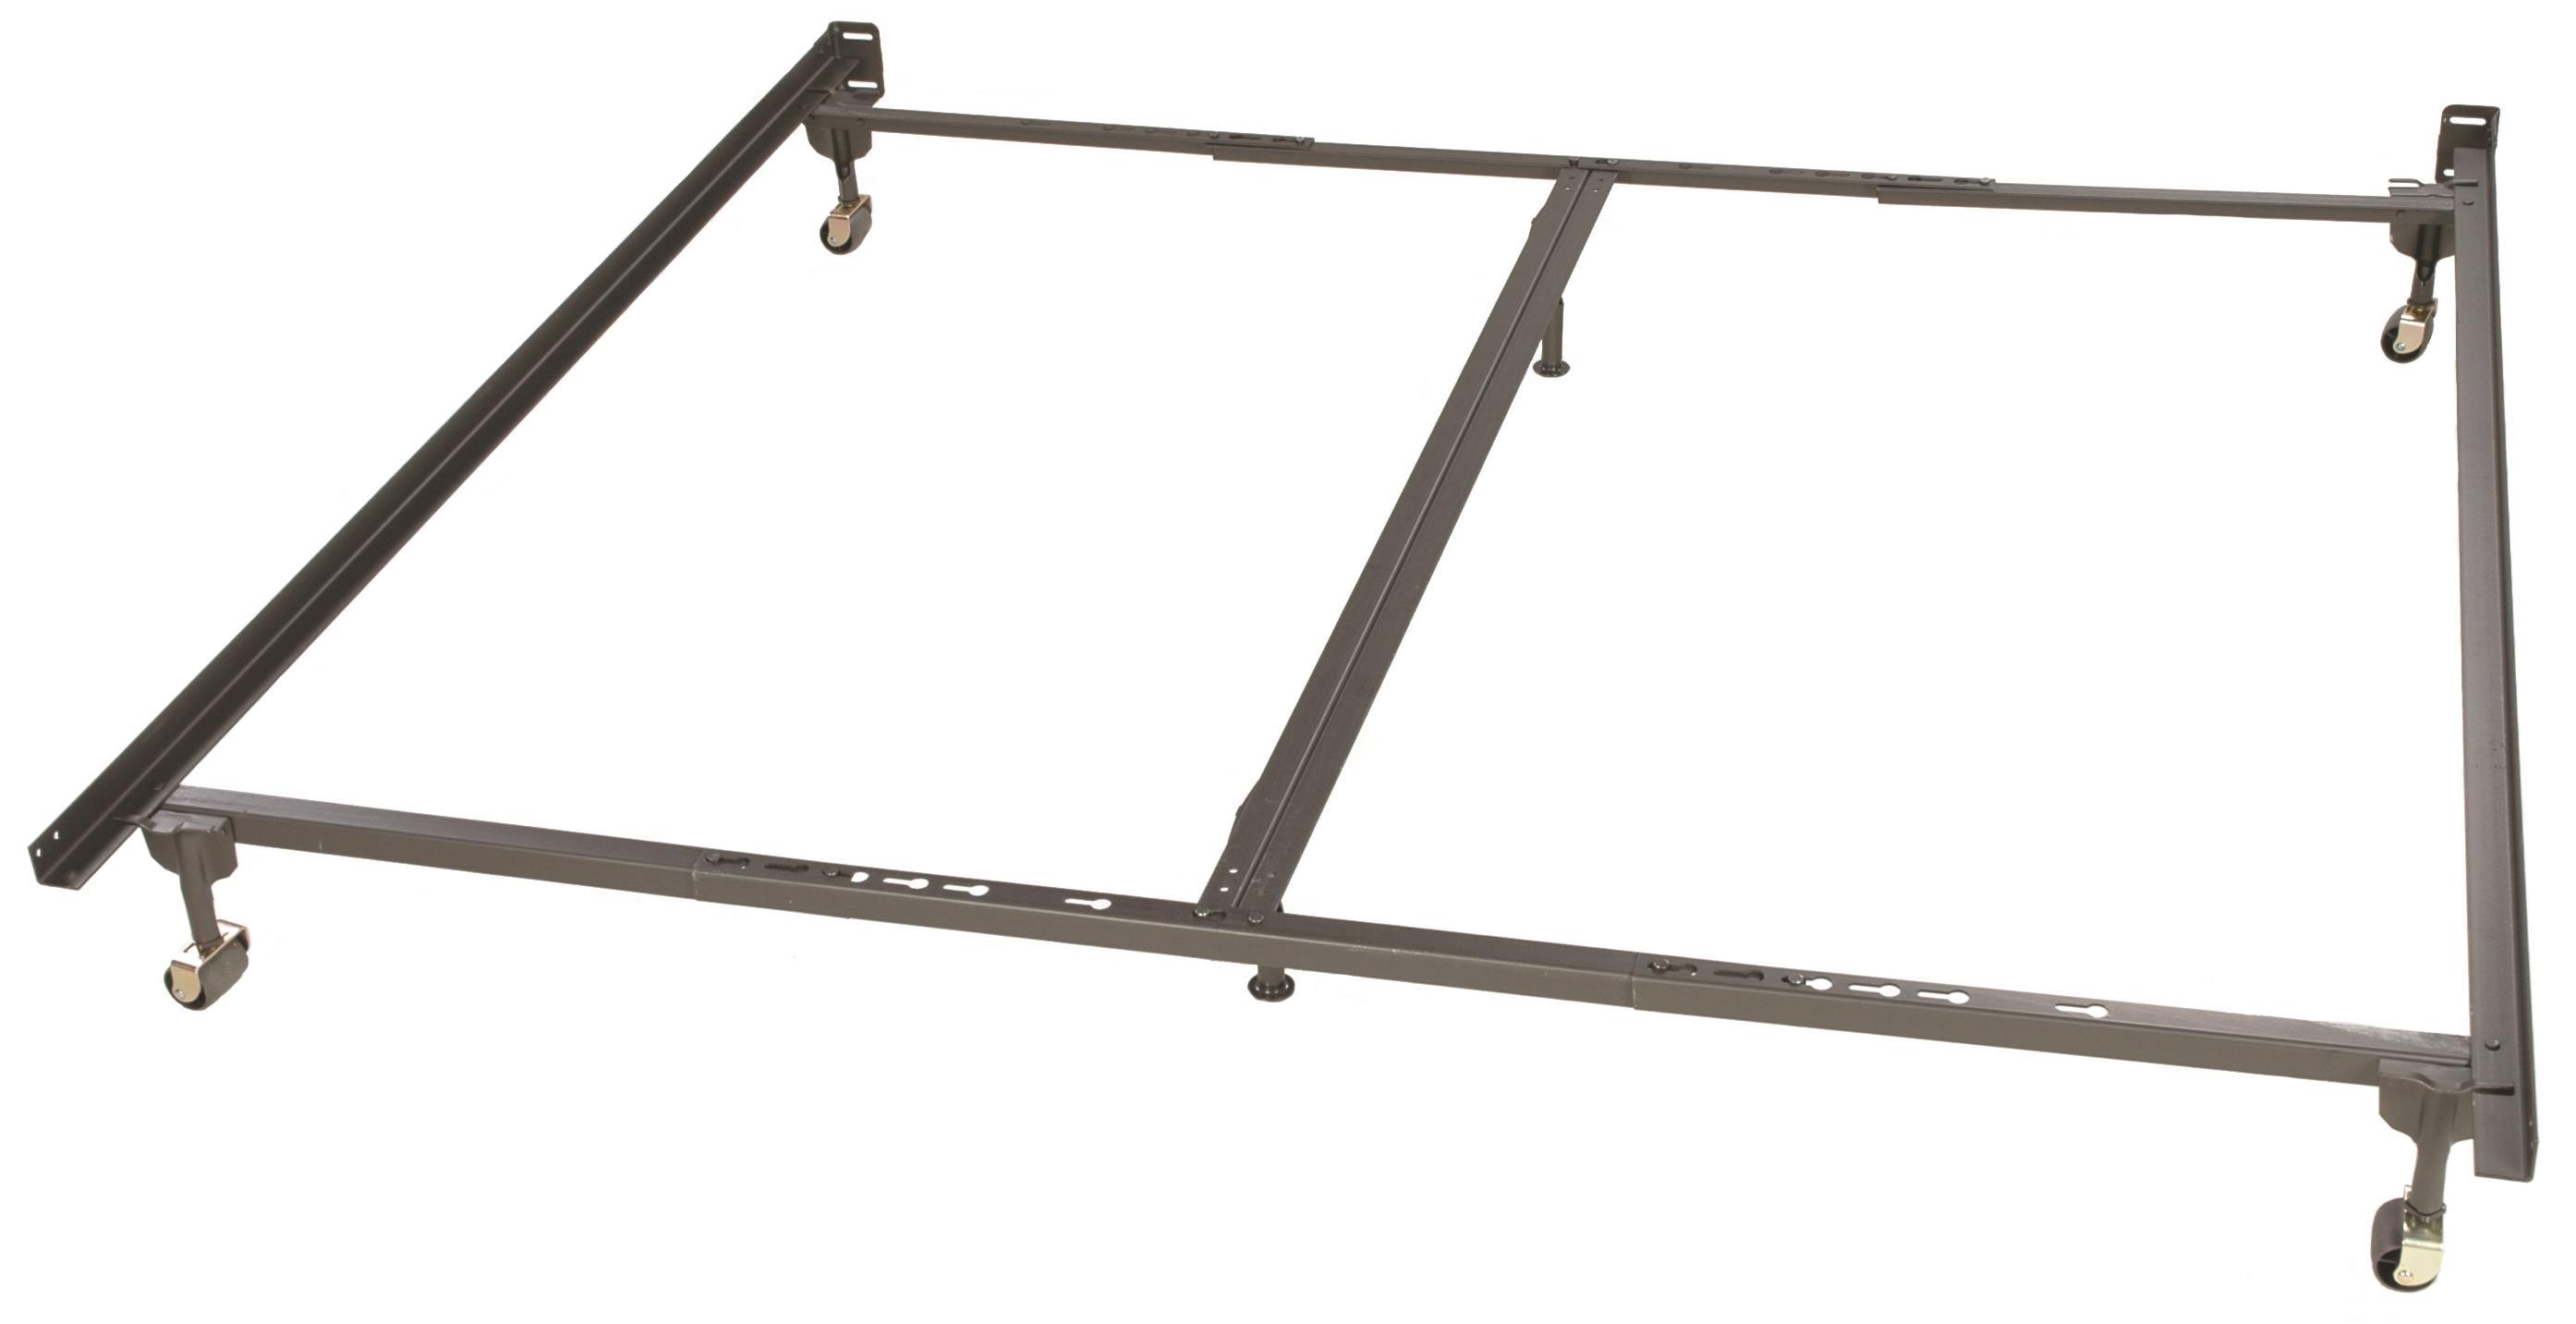 Advantage Standard Rug Roller 6 Leg Queen Rug Roller Frame by Glideaway at Beds N Stuff